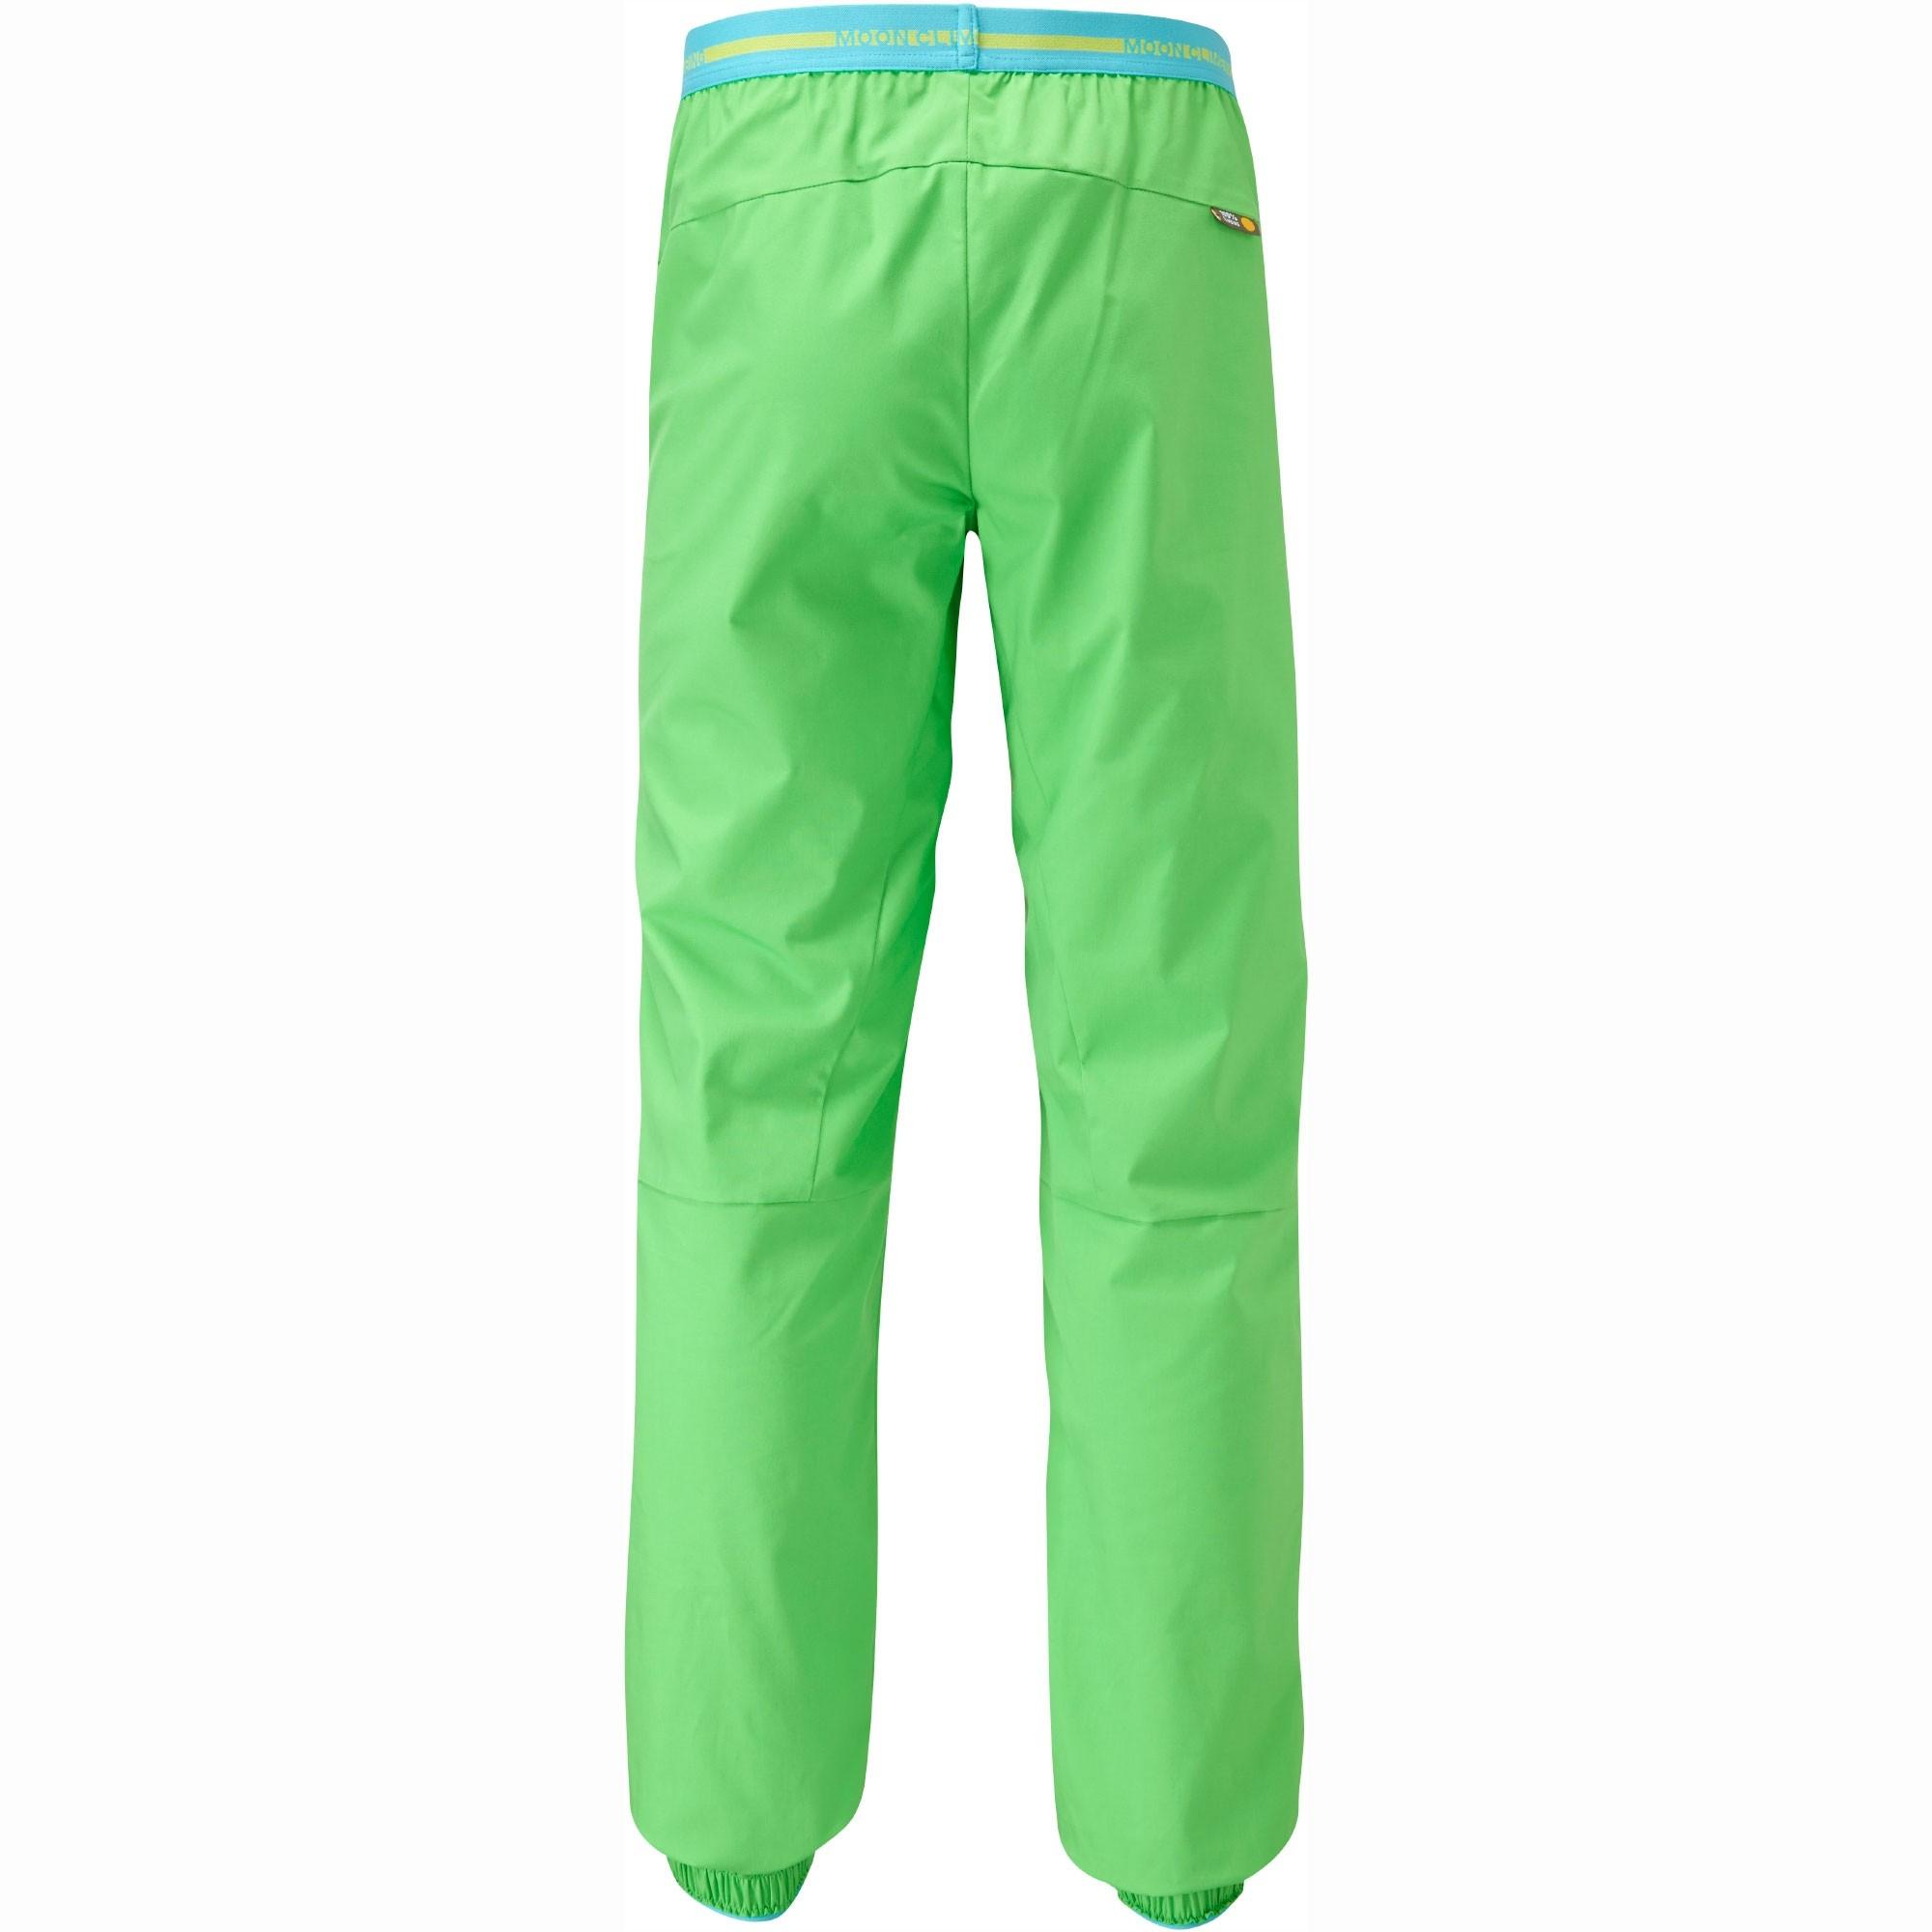 Moon Samurai Climbing Pants - Classic Green